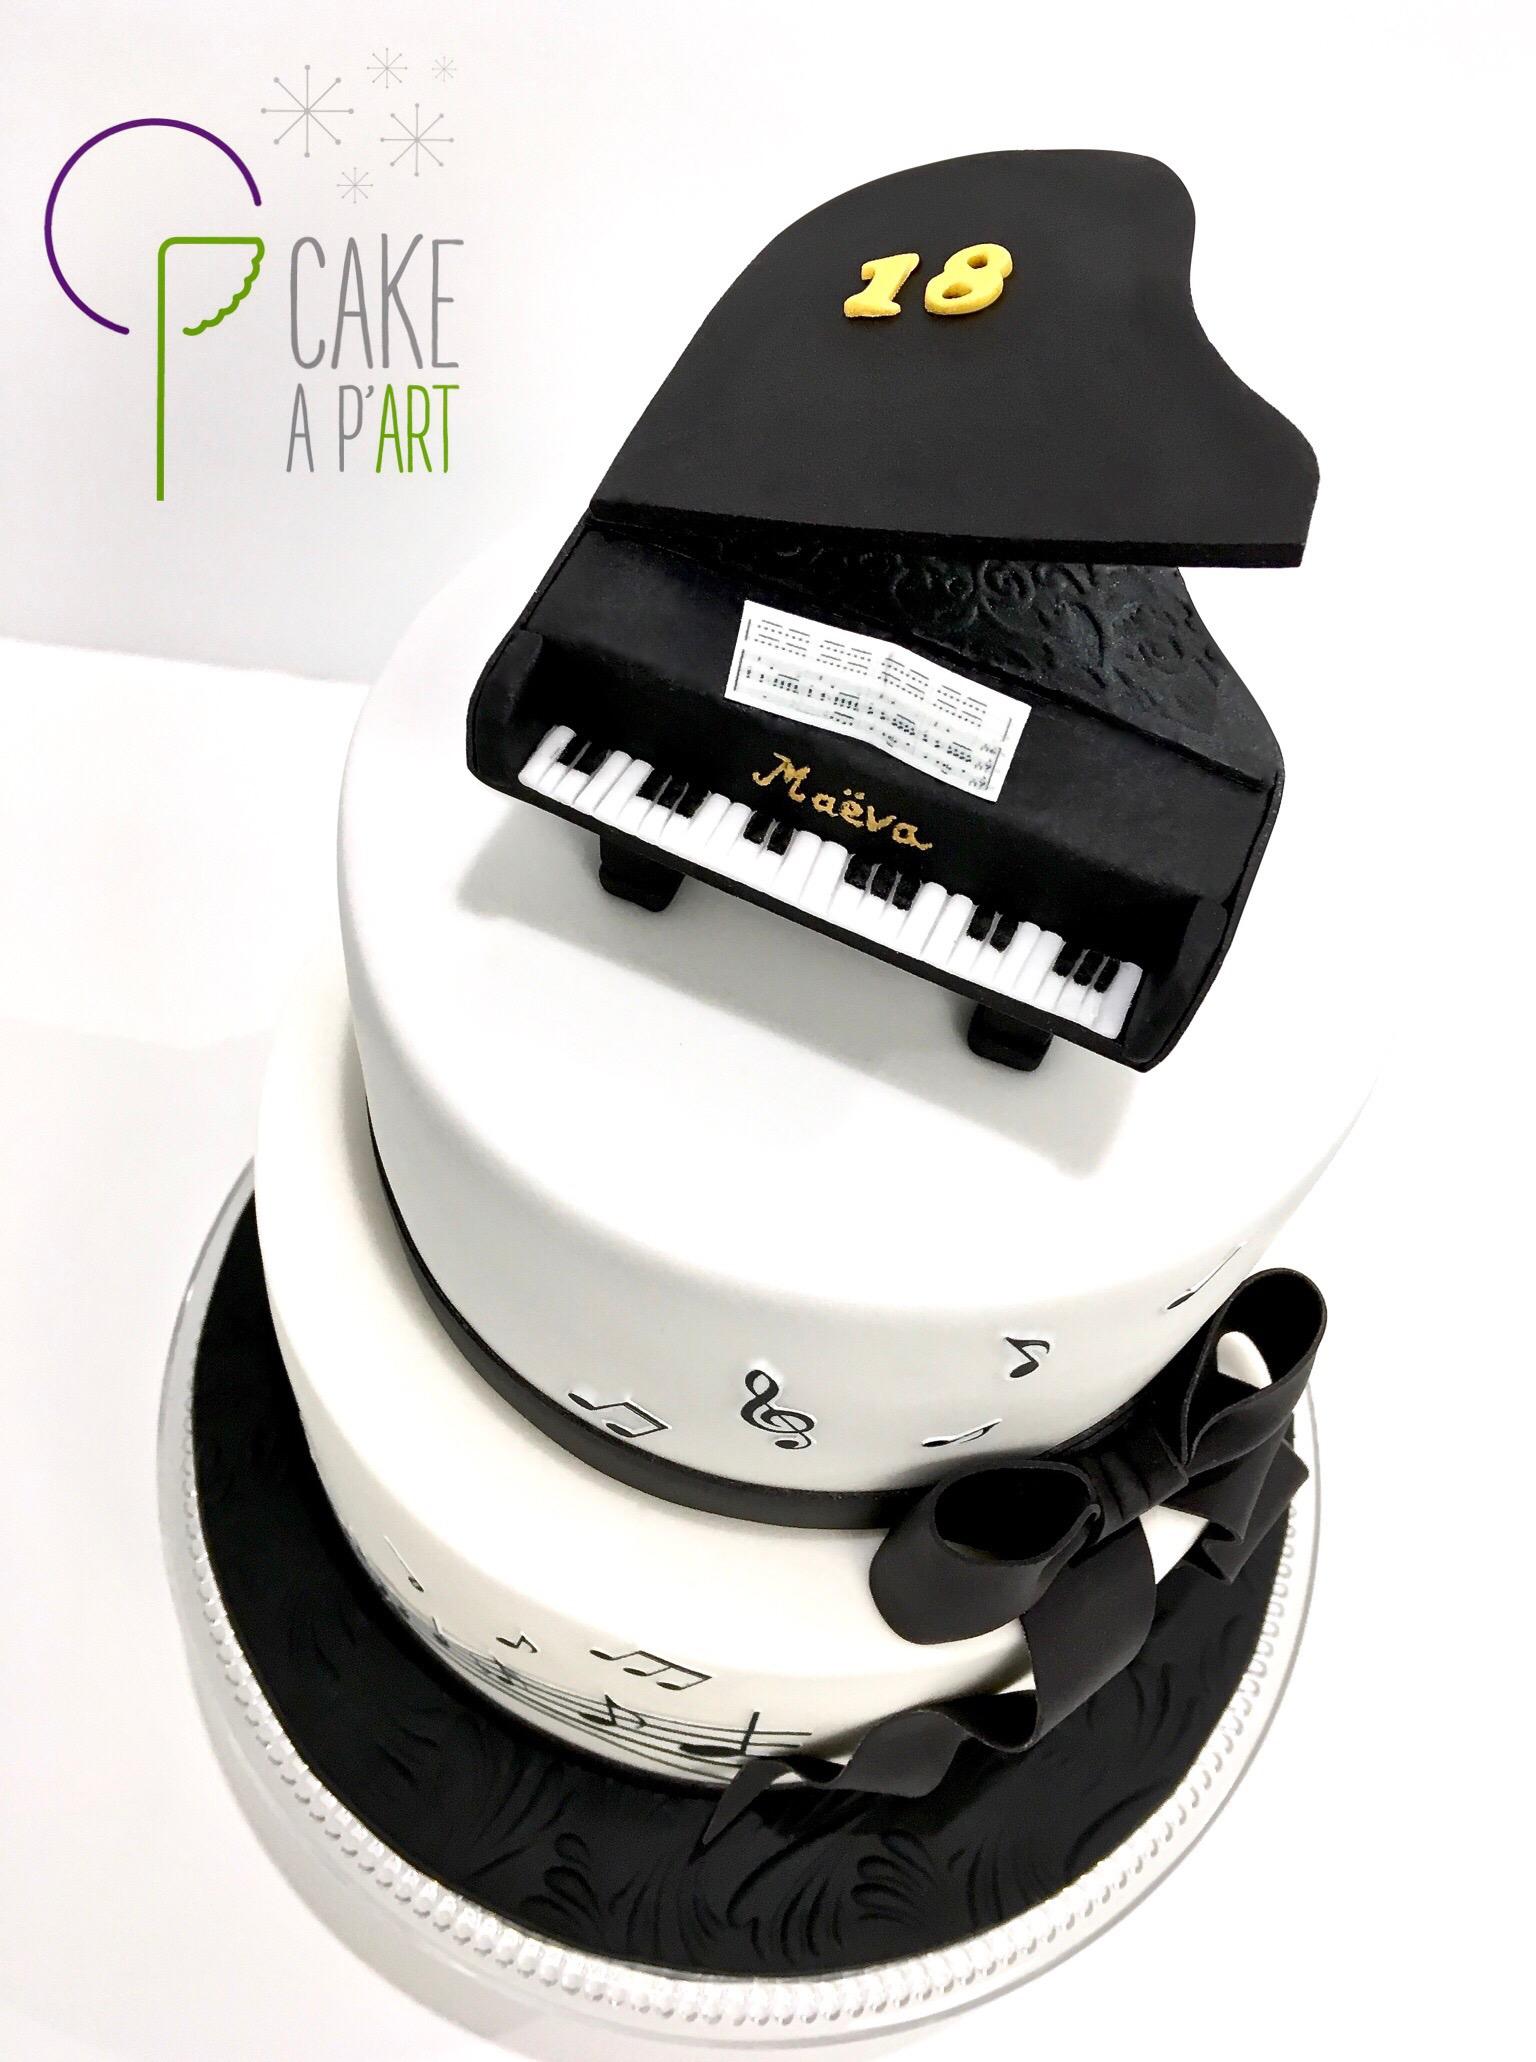 gateau-adulte-musique-piano-note-fille-anniversaire-cakeapart